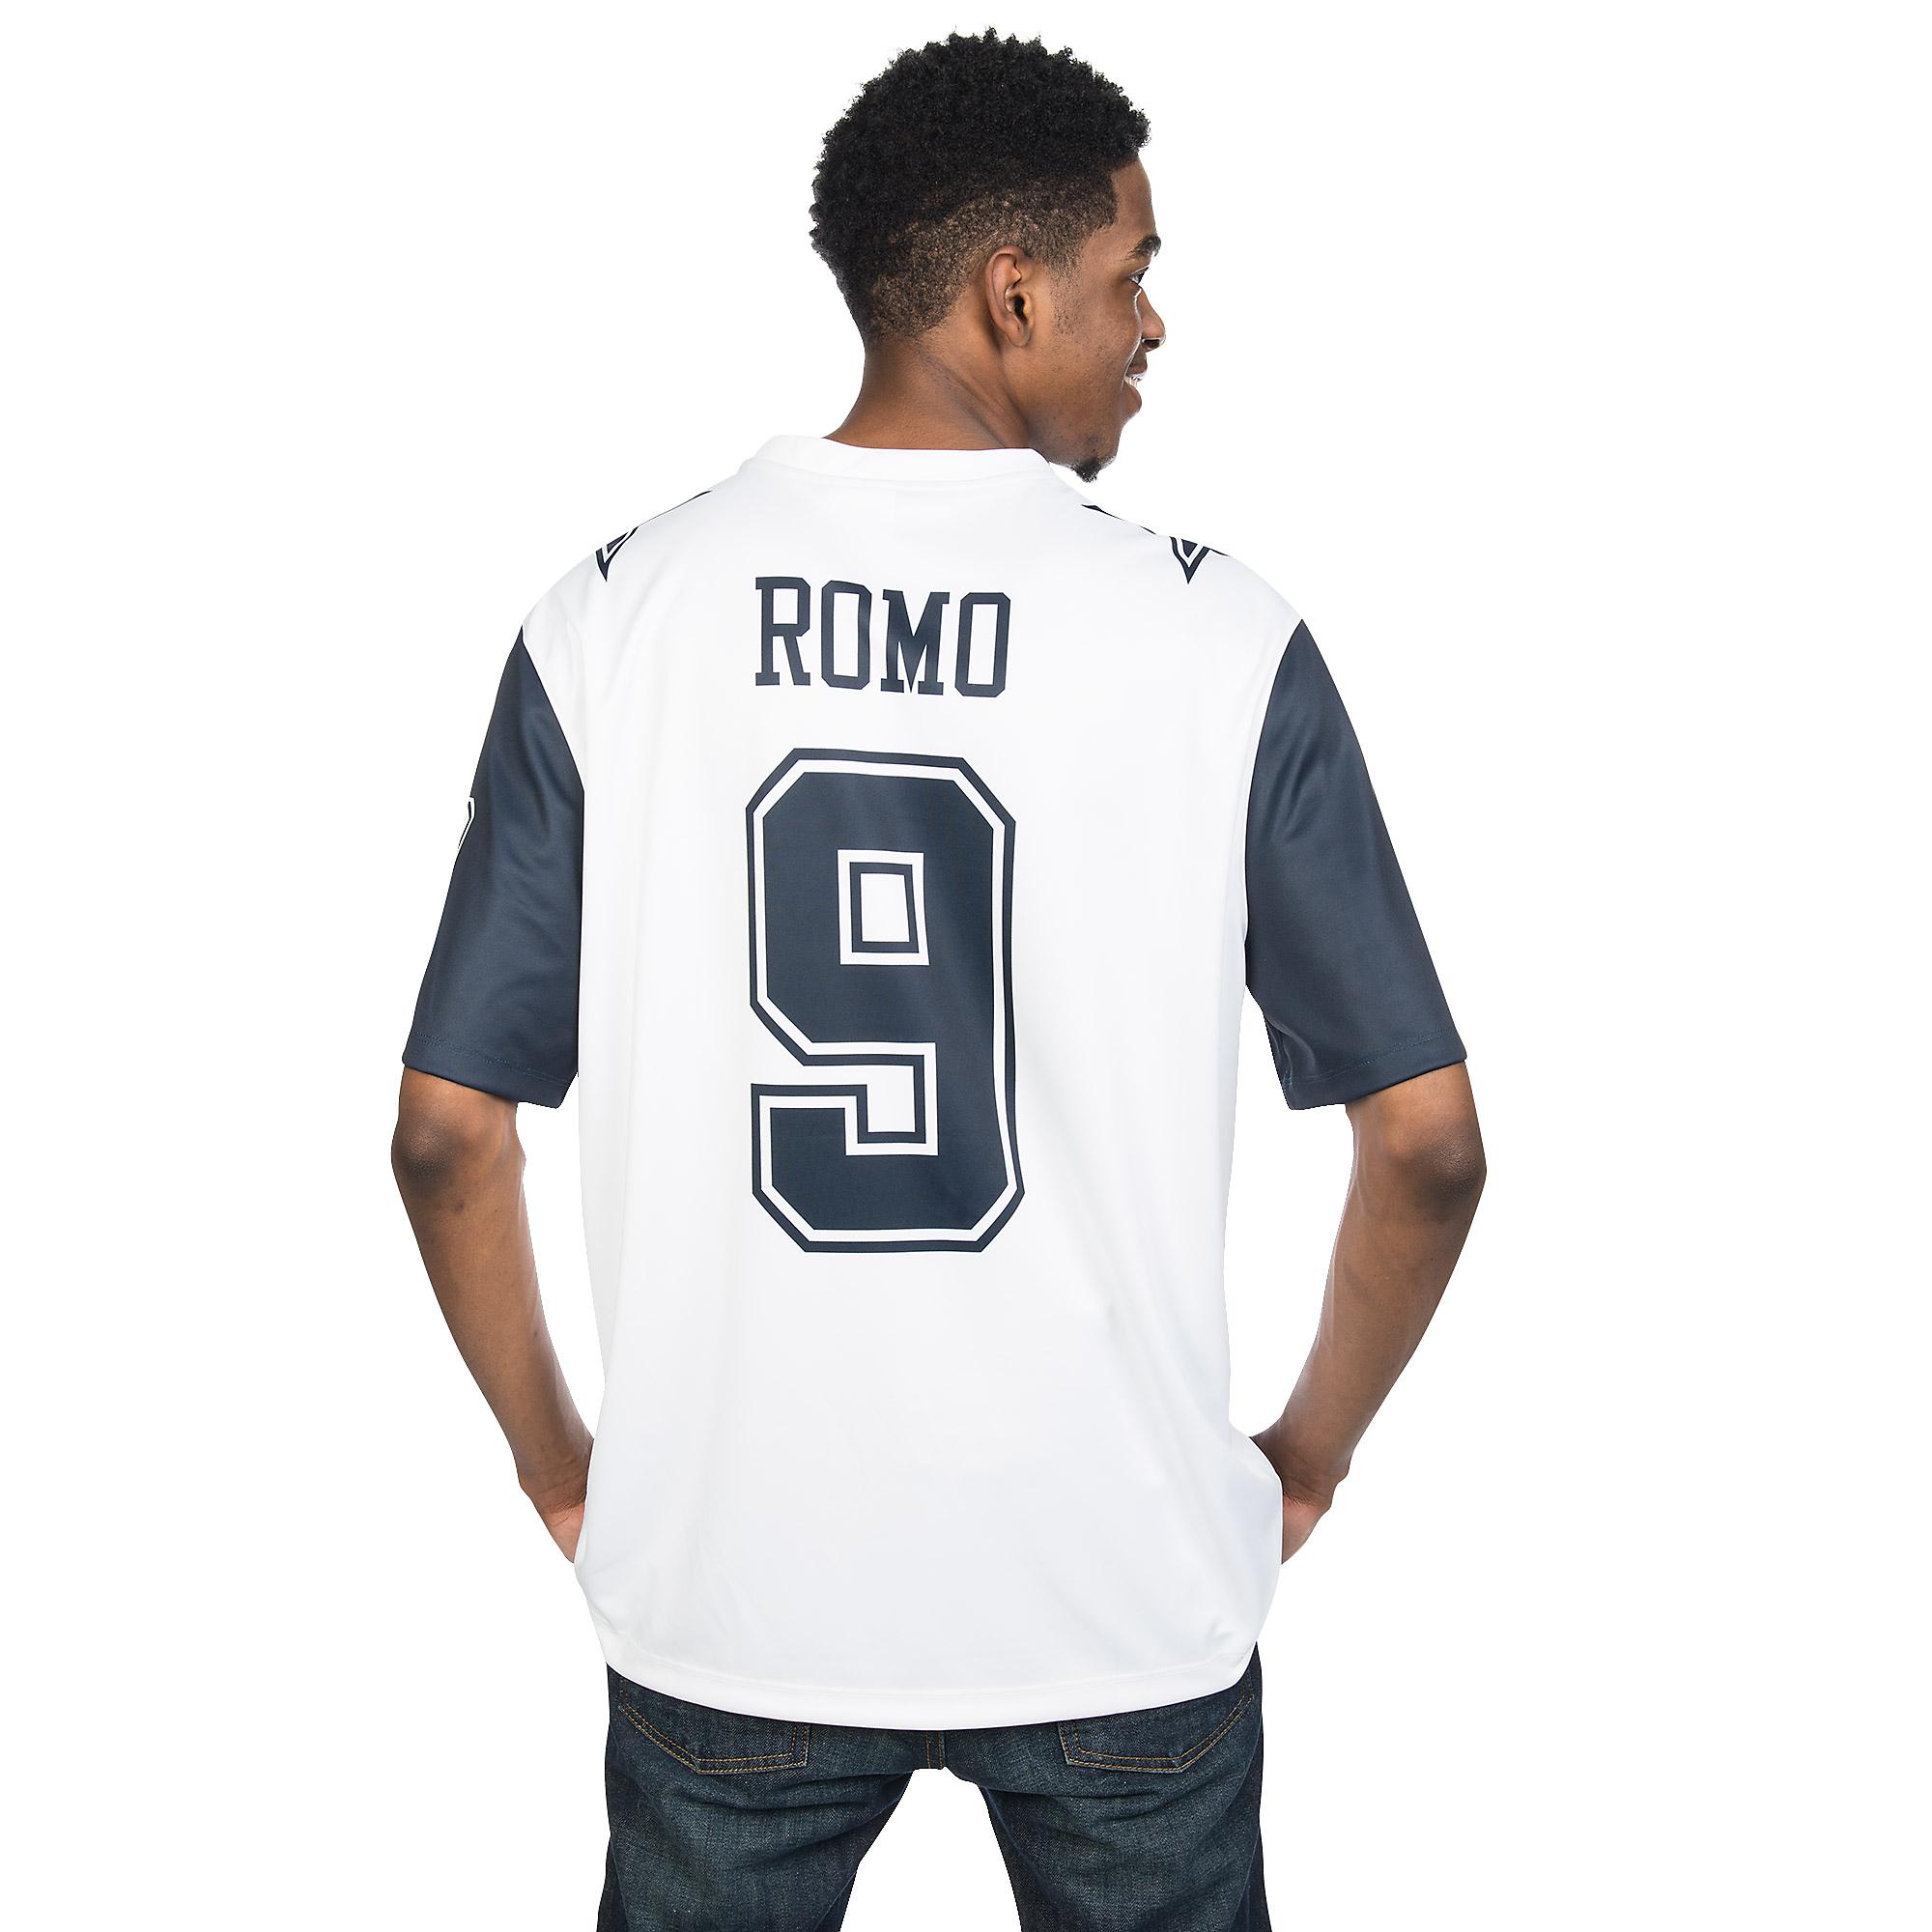 sports shoes 892e0 4e997 Dallas Cowboys Tony Romo #9 Nike XC2 Color Rush Tee   Fans ...